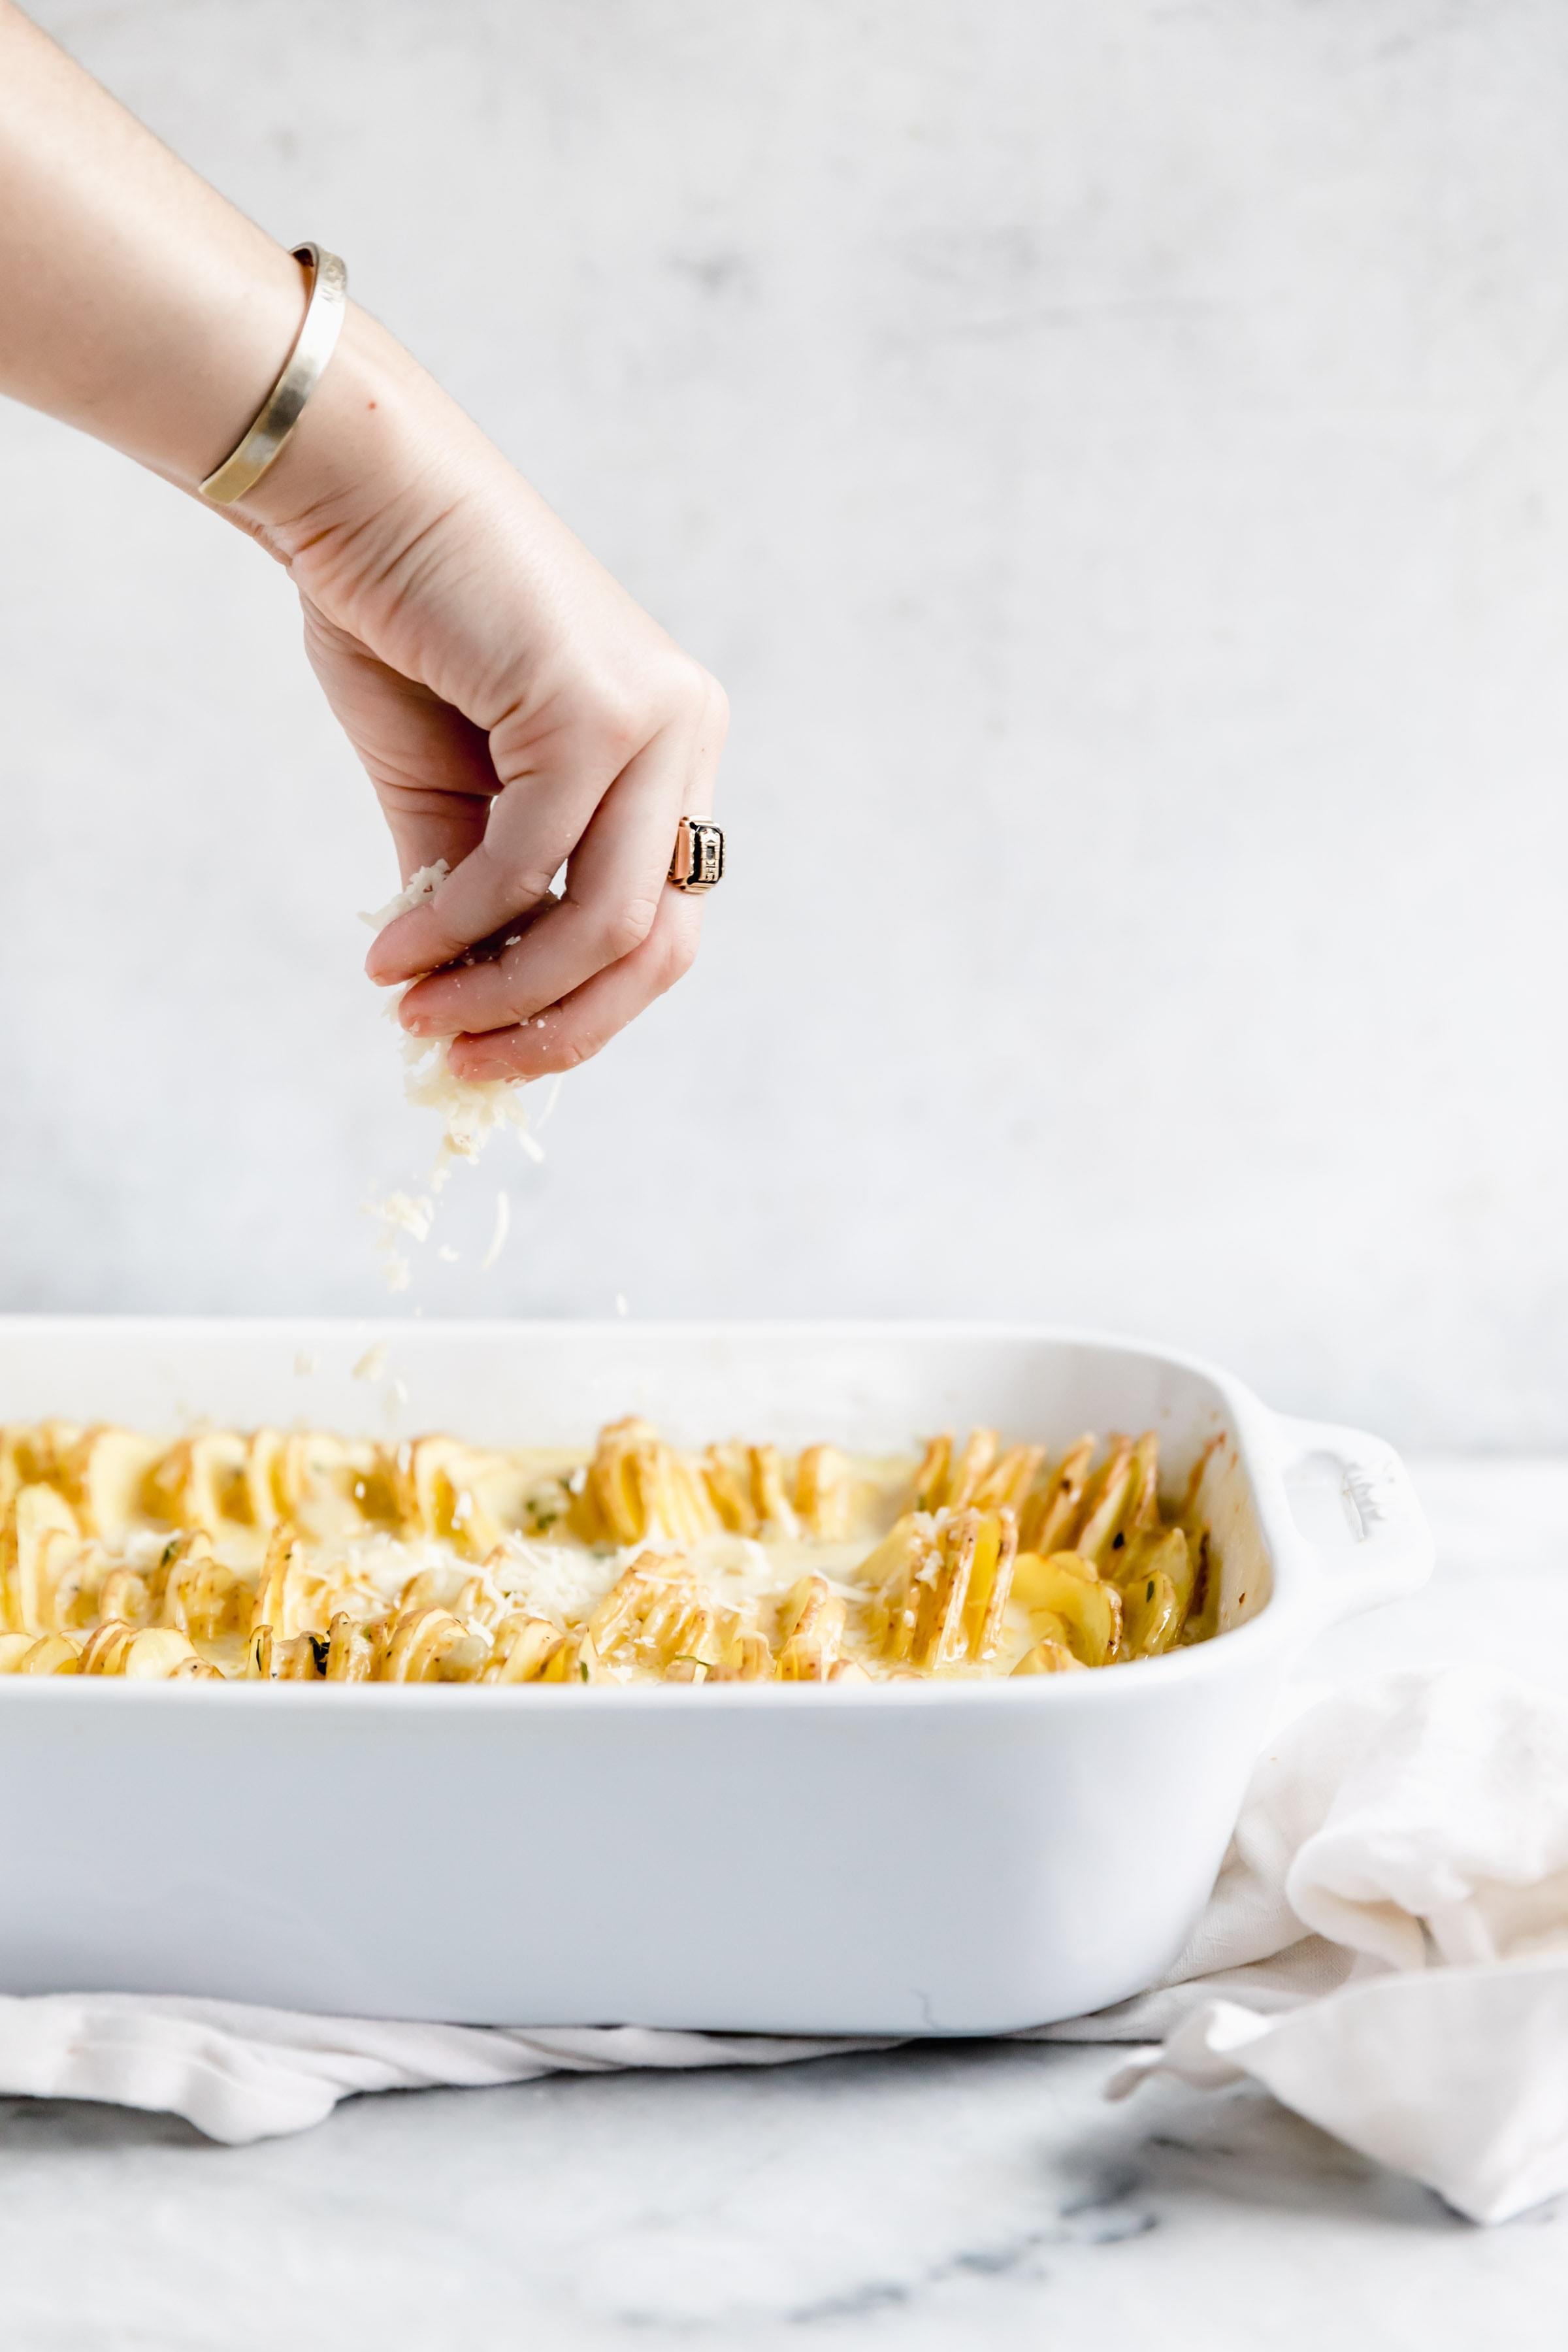 sprinkle cheese onto potatoes